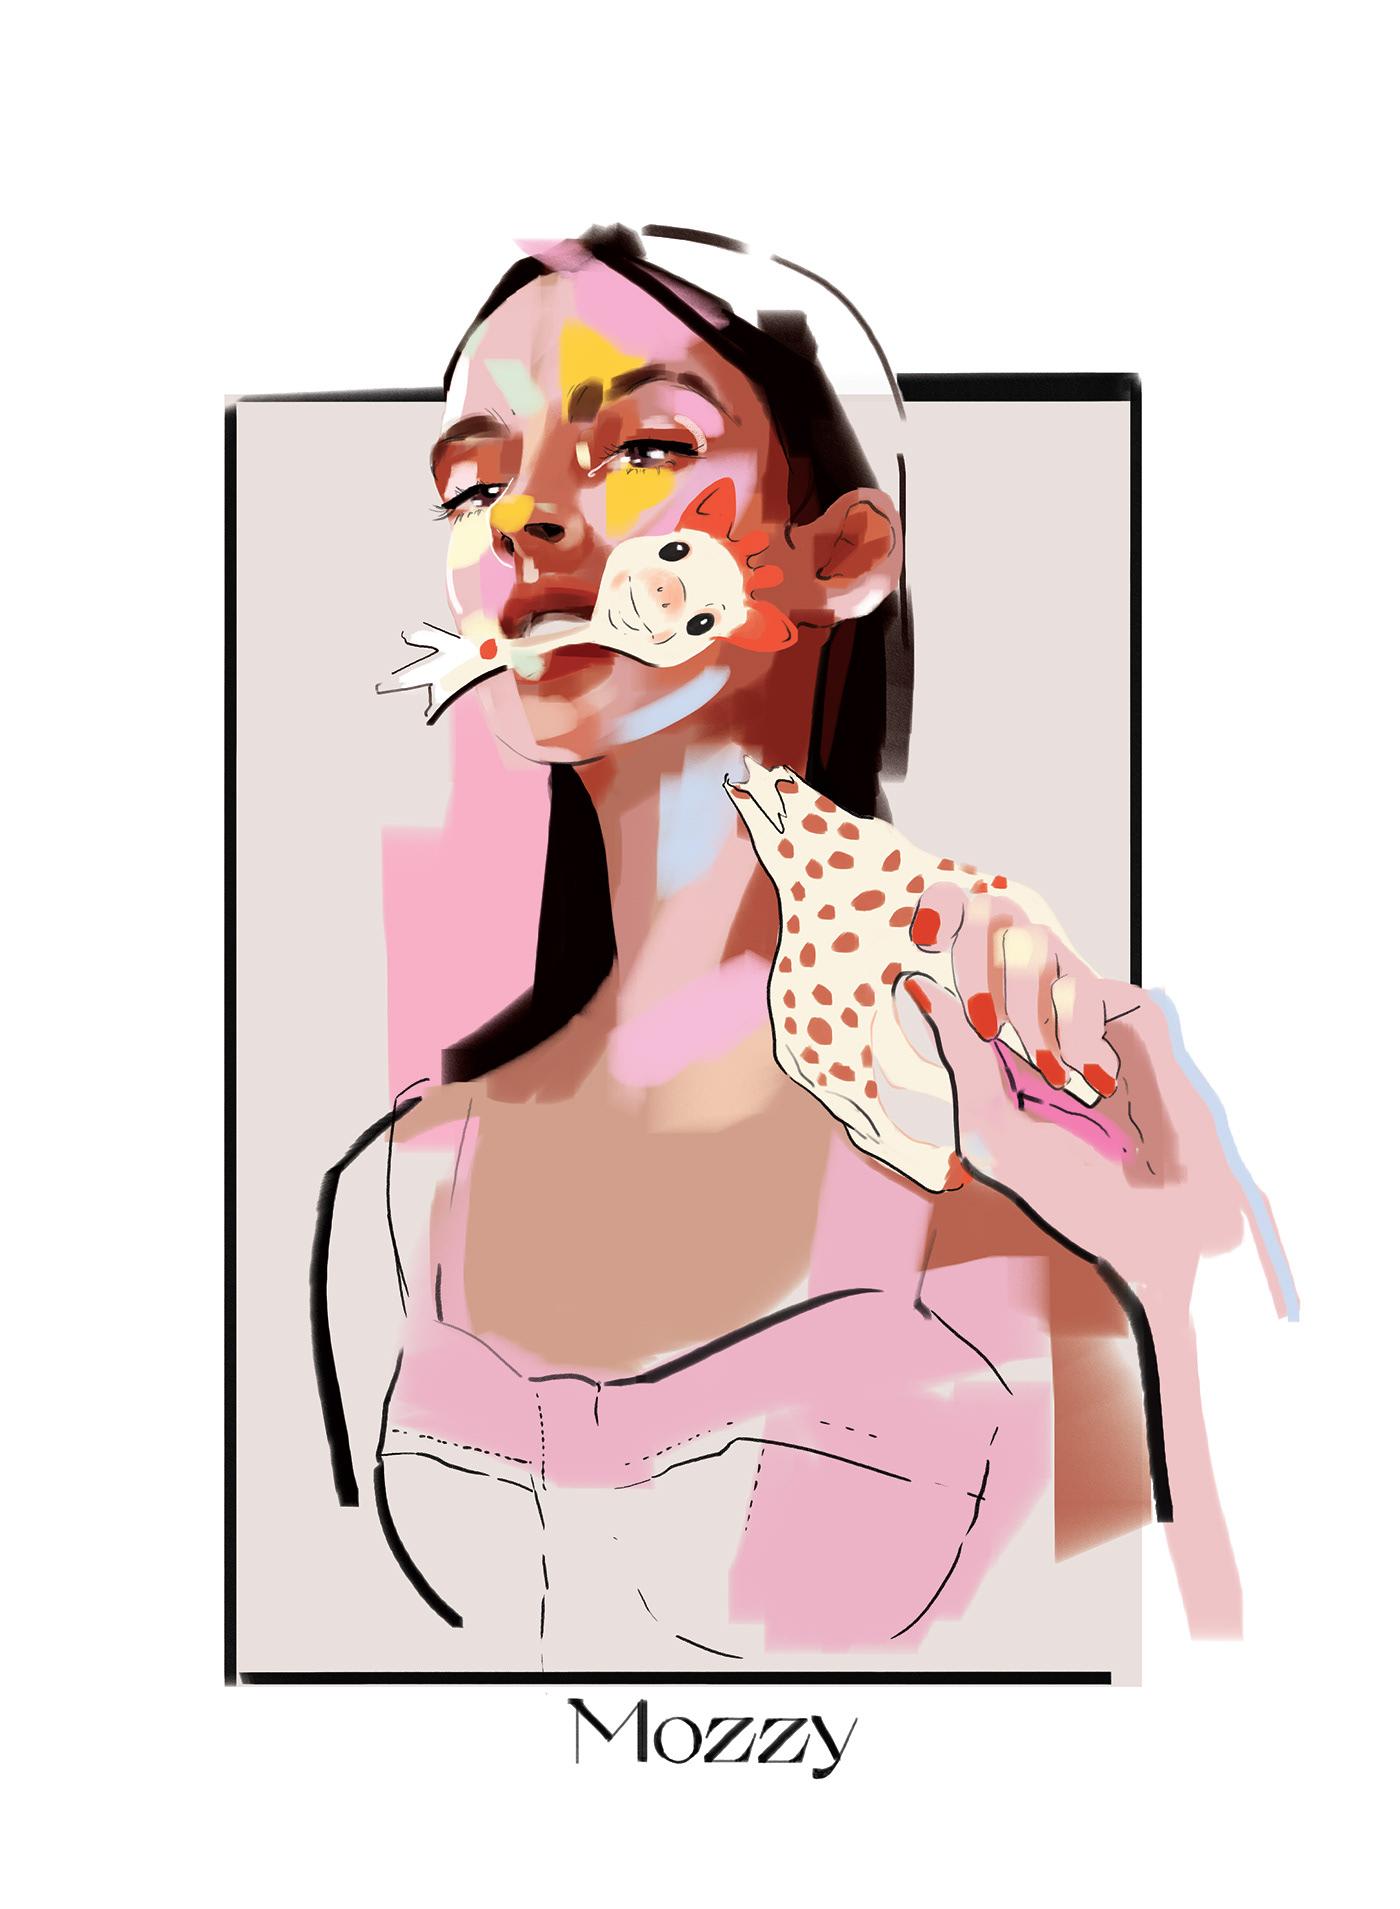 angry Fashion  fashion illustration giraffe ILLUSTRATION  mother motherhood painting   sketch woman